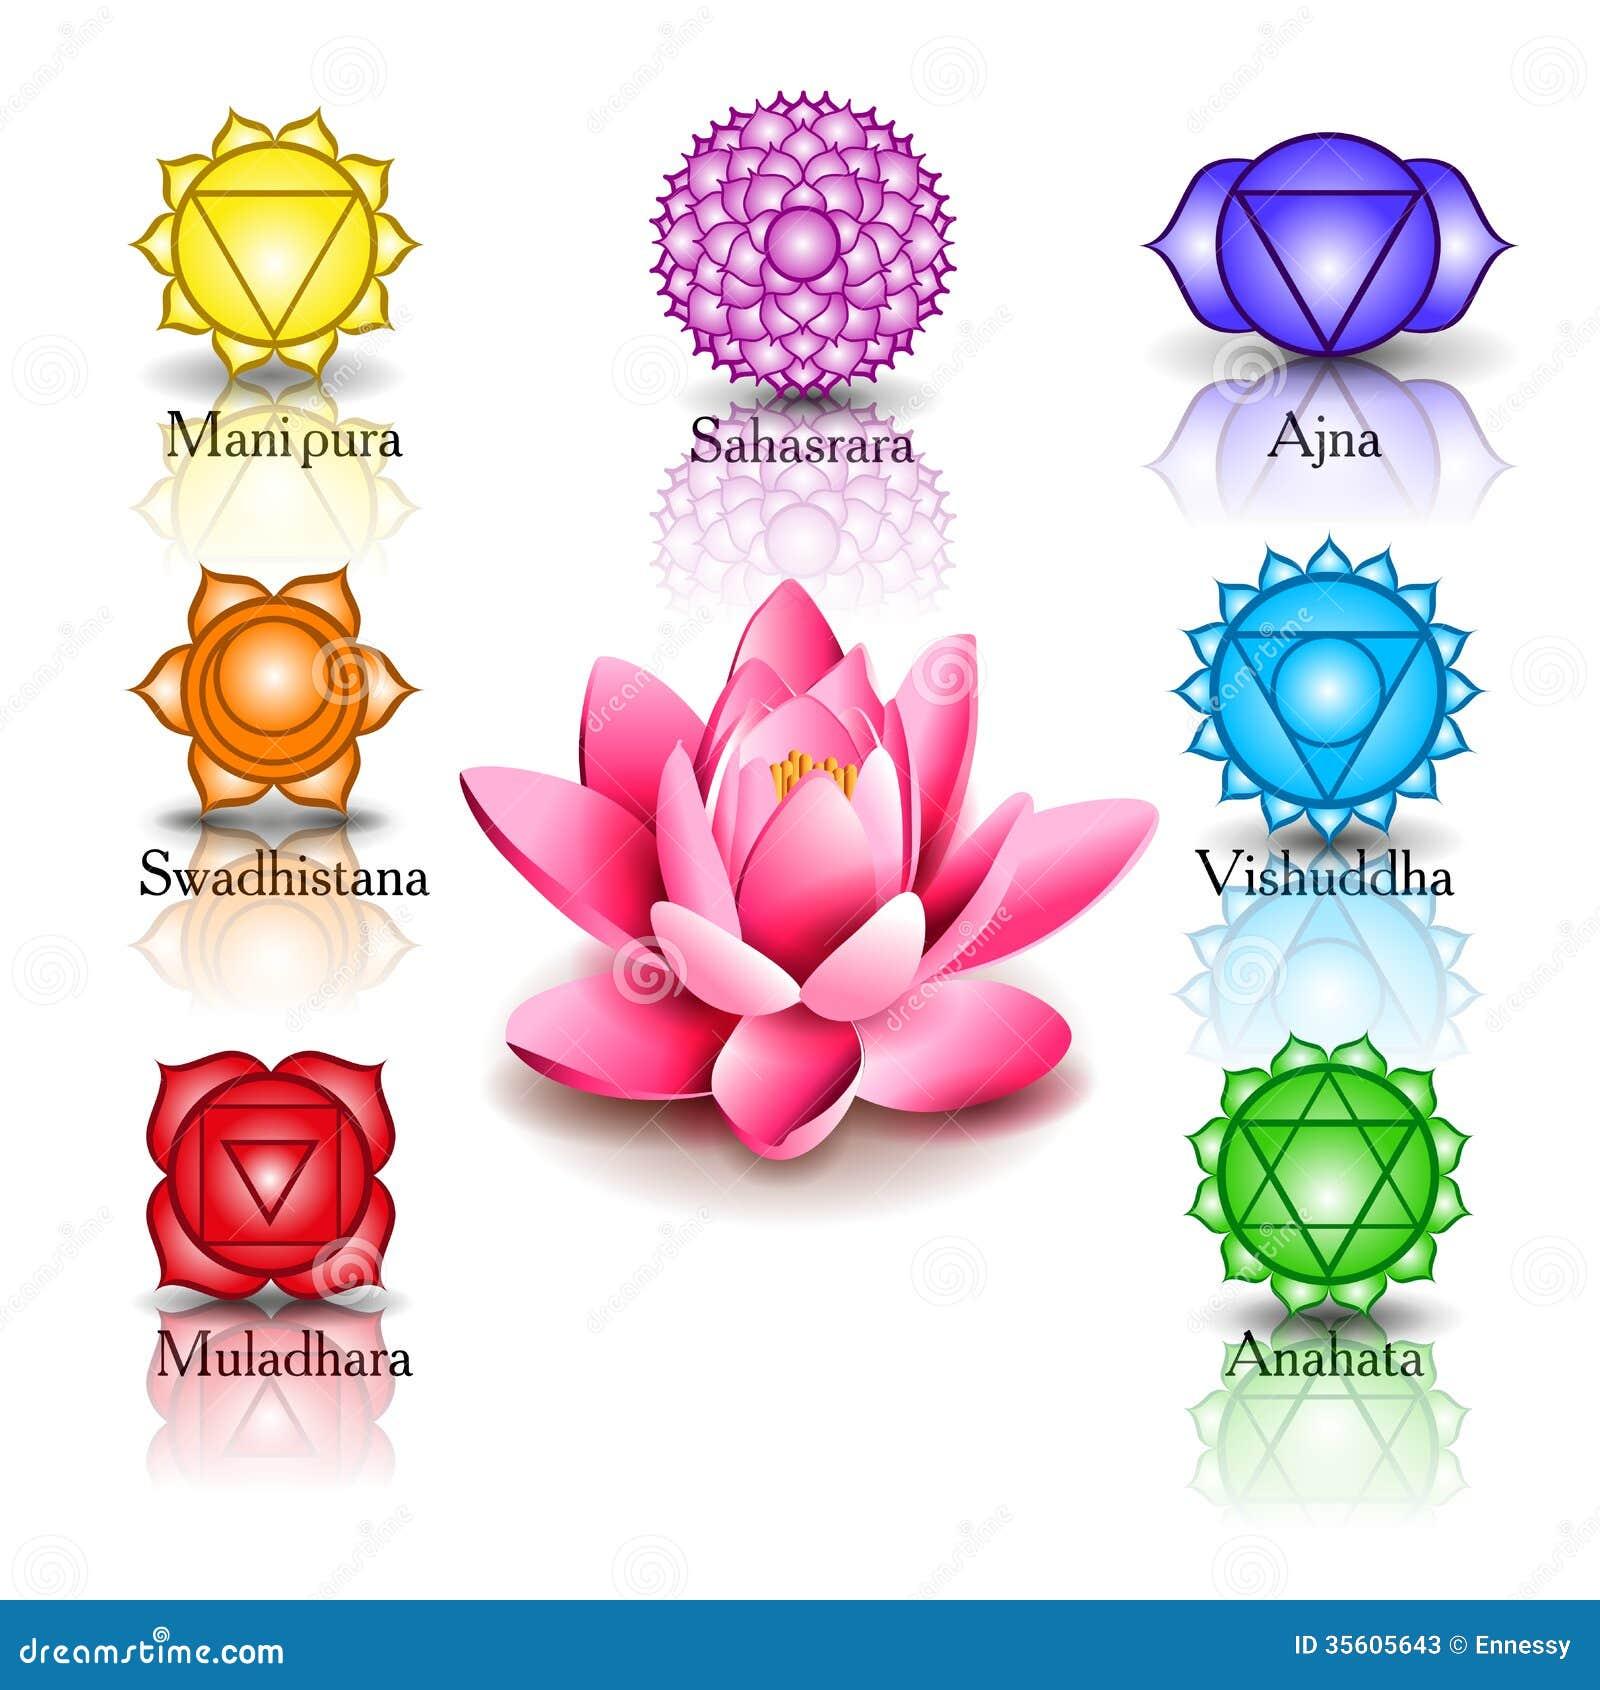 Lotus And Seven Chakras Stock Photos - Image: 35605643